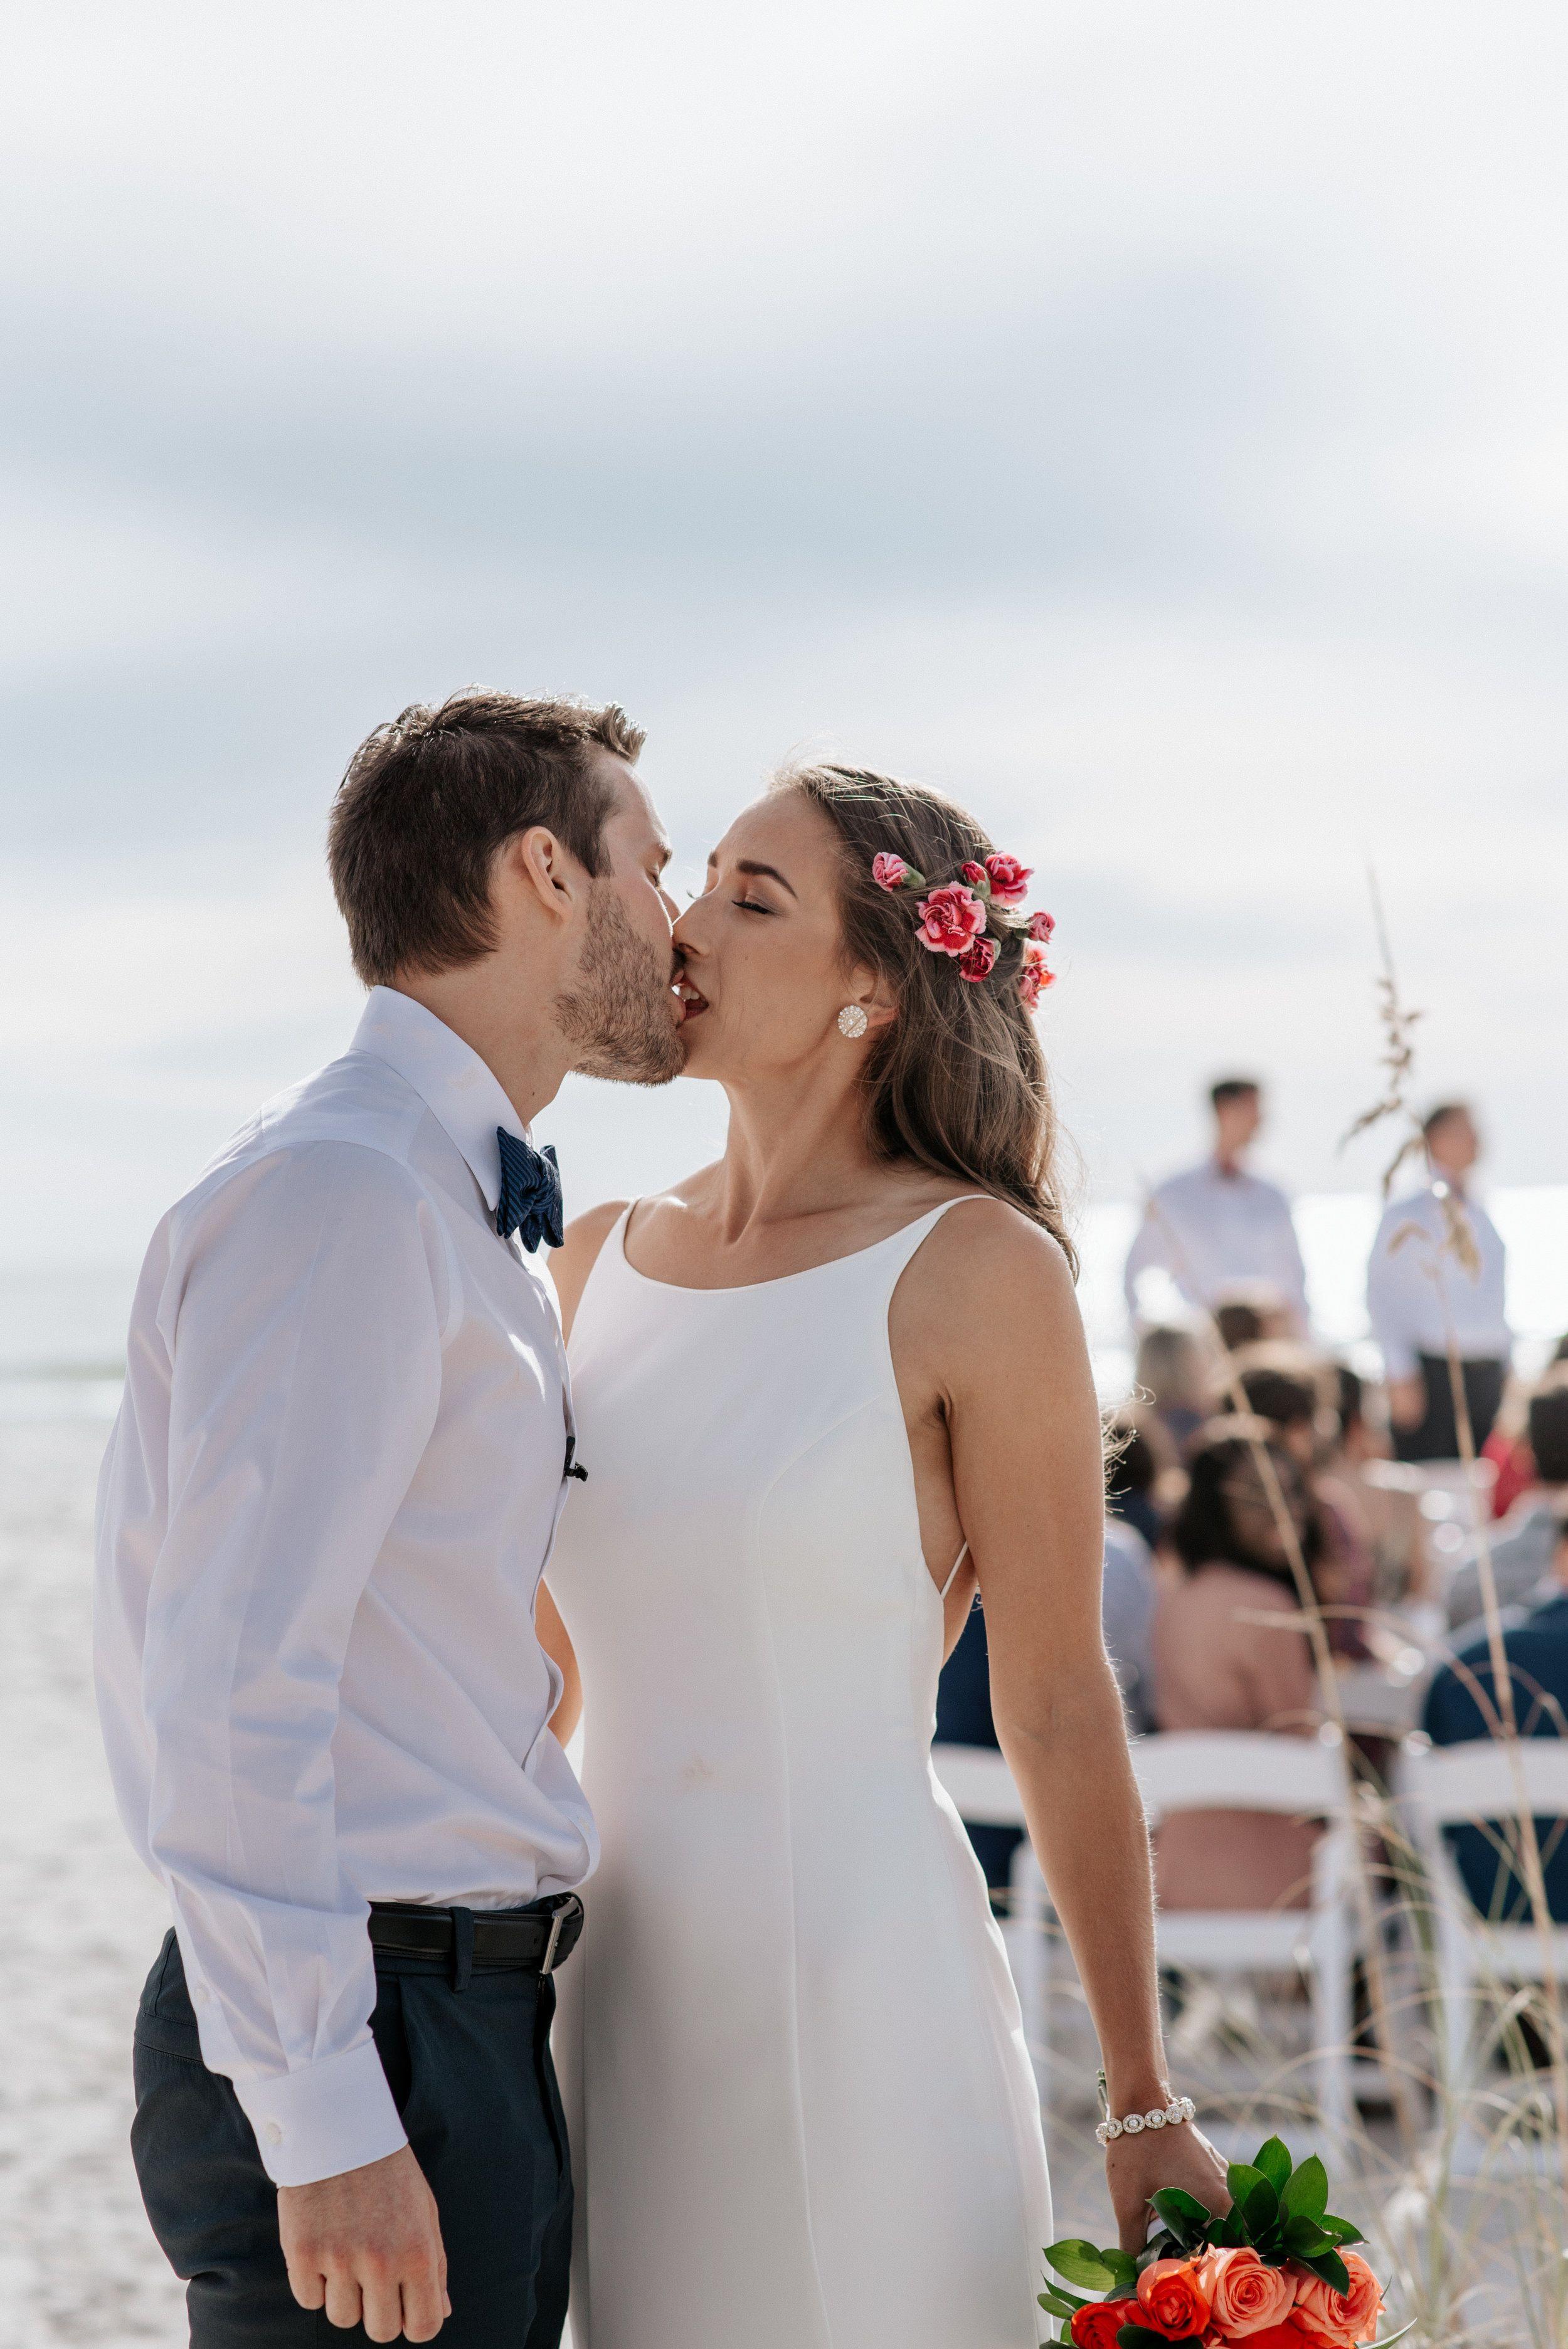 Florida Wedding Photographer Florida Wedding Photography Florida Wedding Photo Orlando Wedding Photography Orlando Wedding Photographer Wedding Photographers